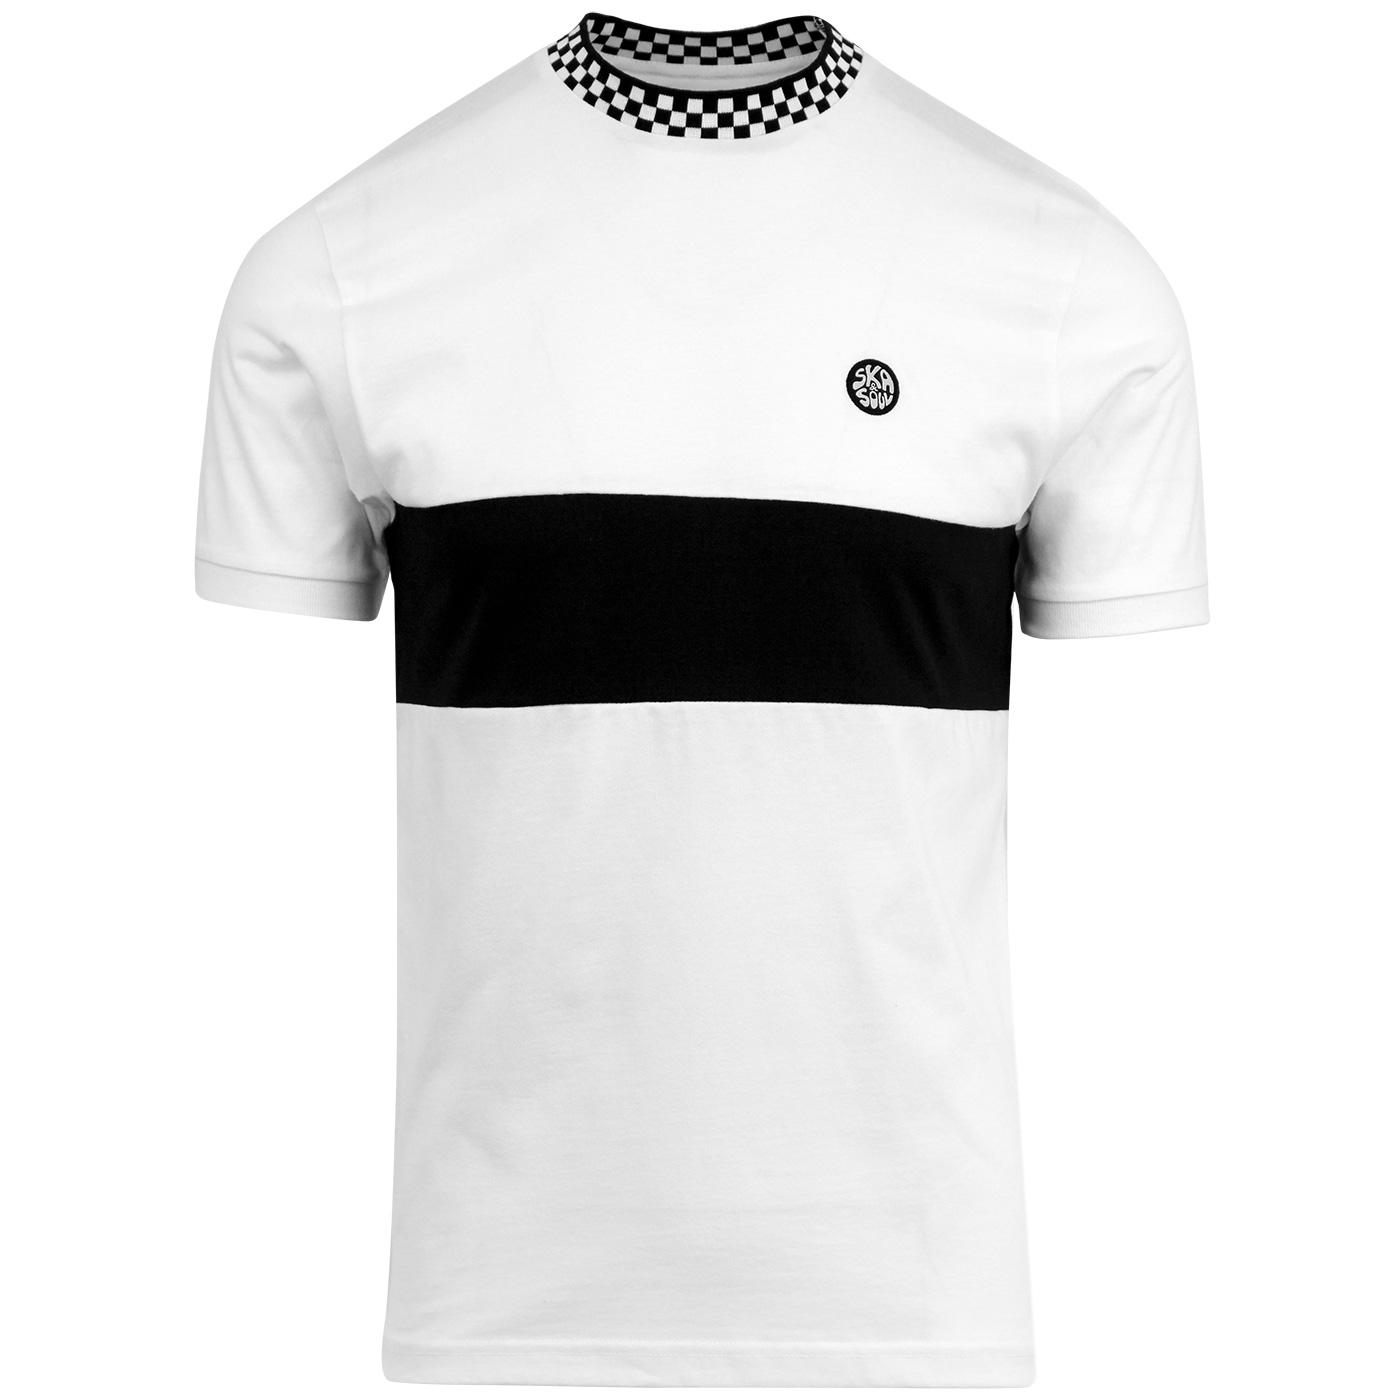 SKA & SOUL Men's Mod Checkerboard Trim T-Shirt W